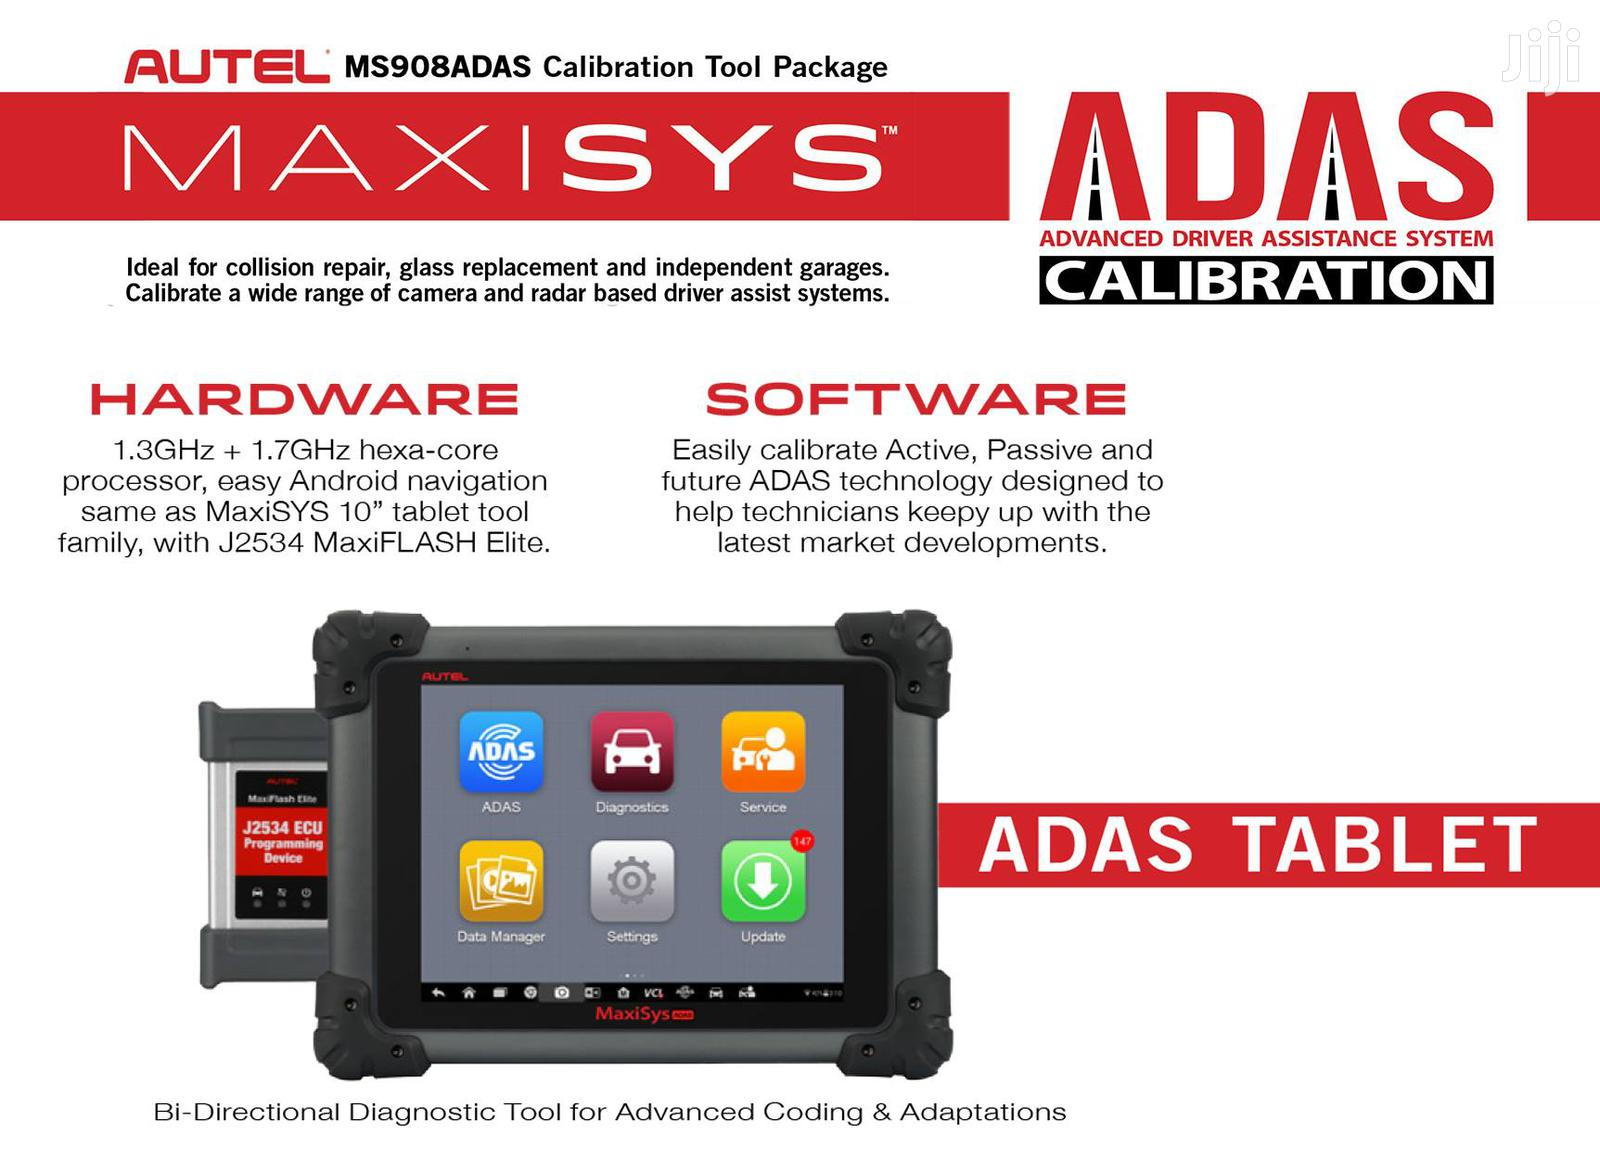 Autel Maxisys Scan Tool With ADAS Calibration Tablet MSADAS